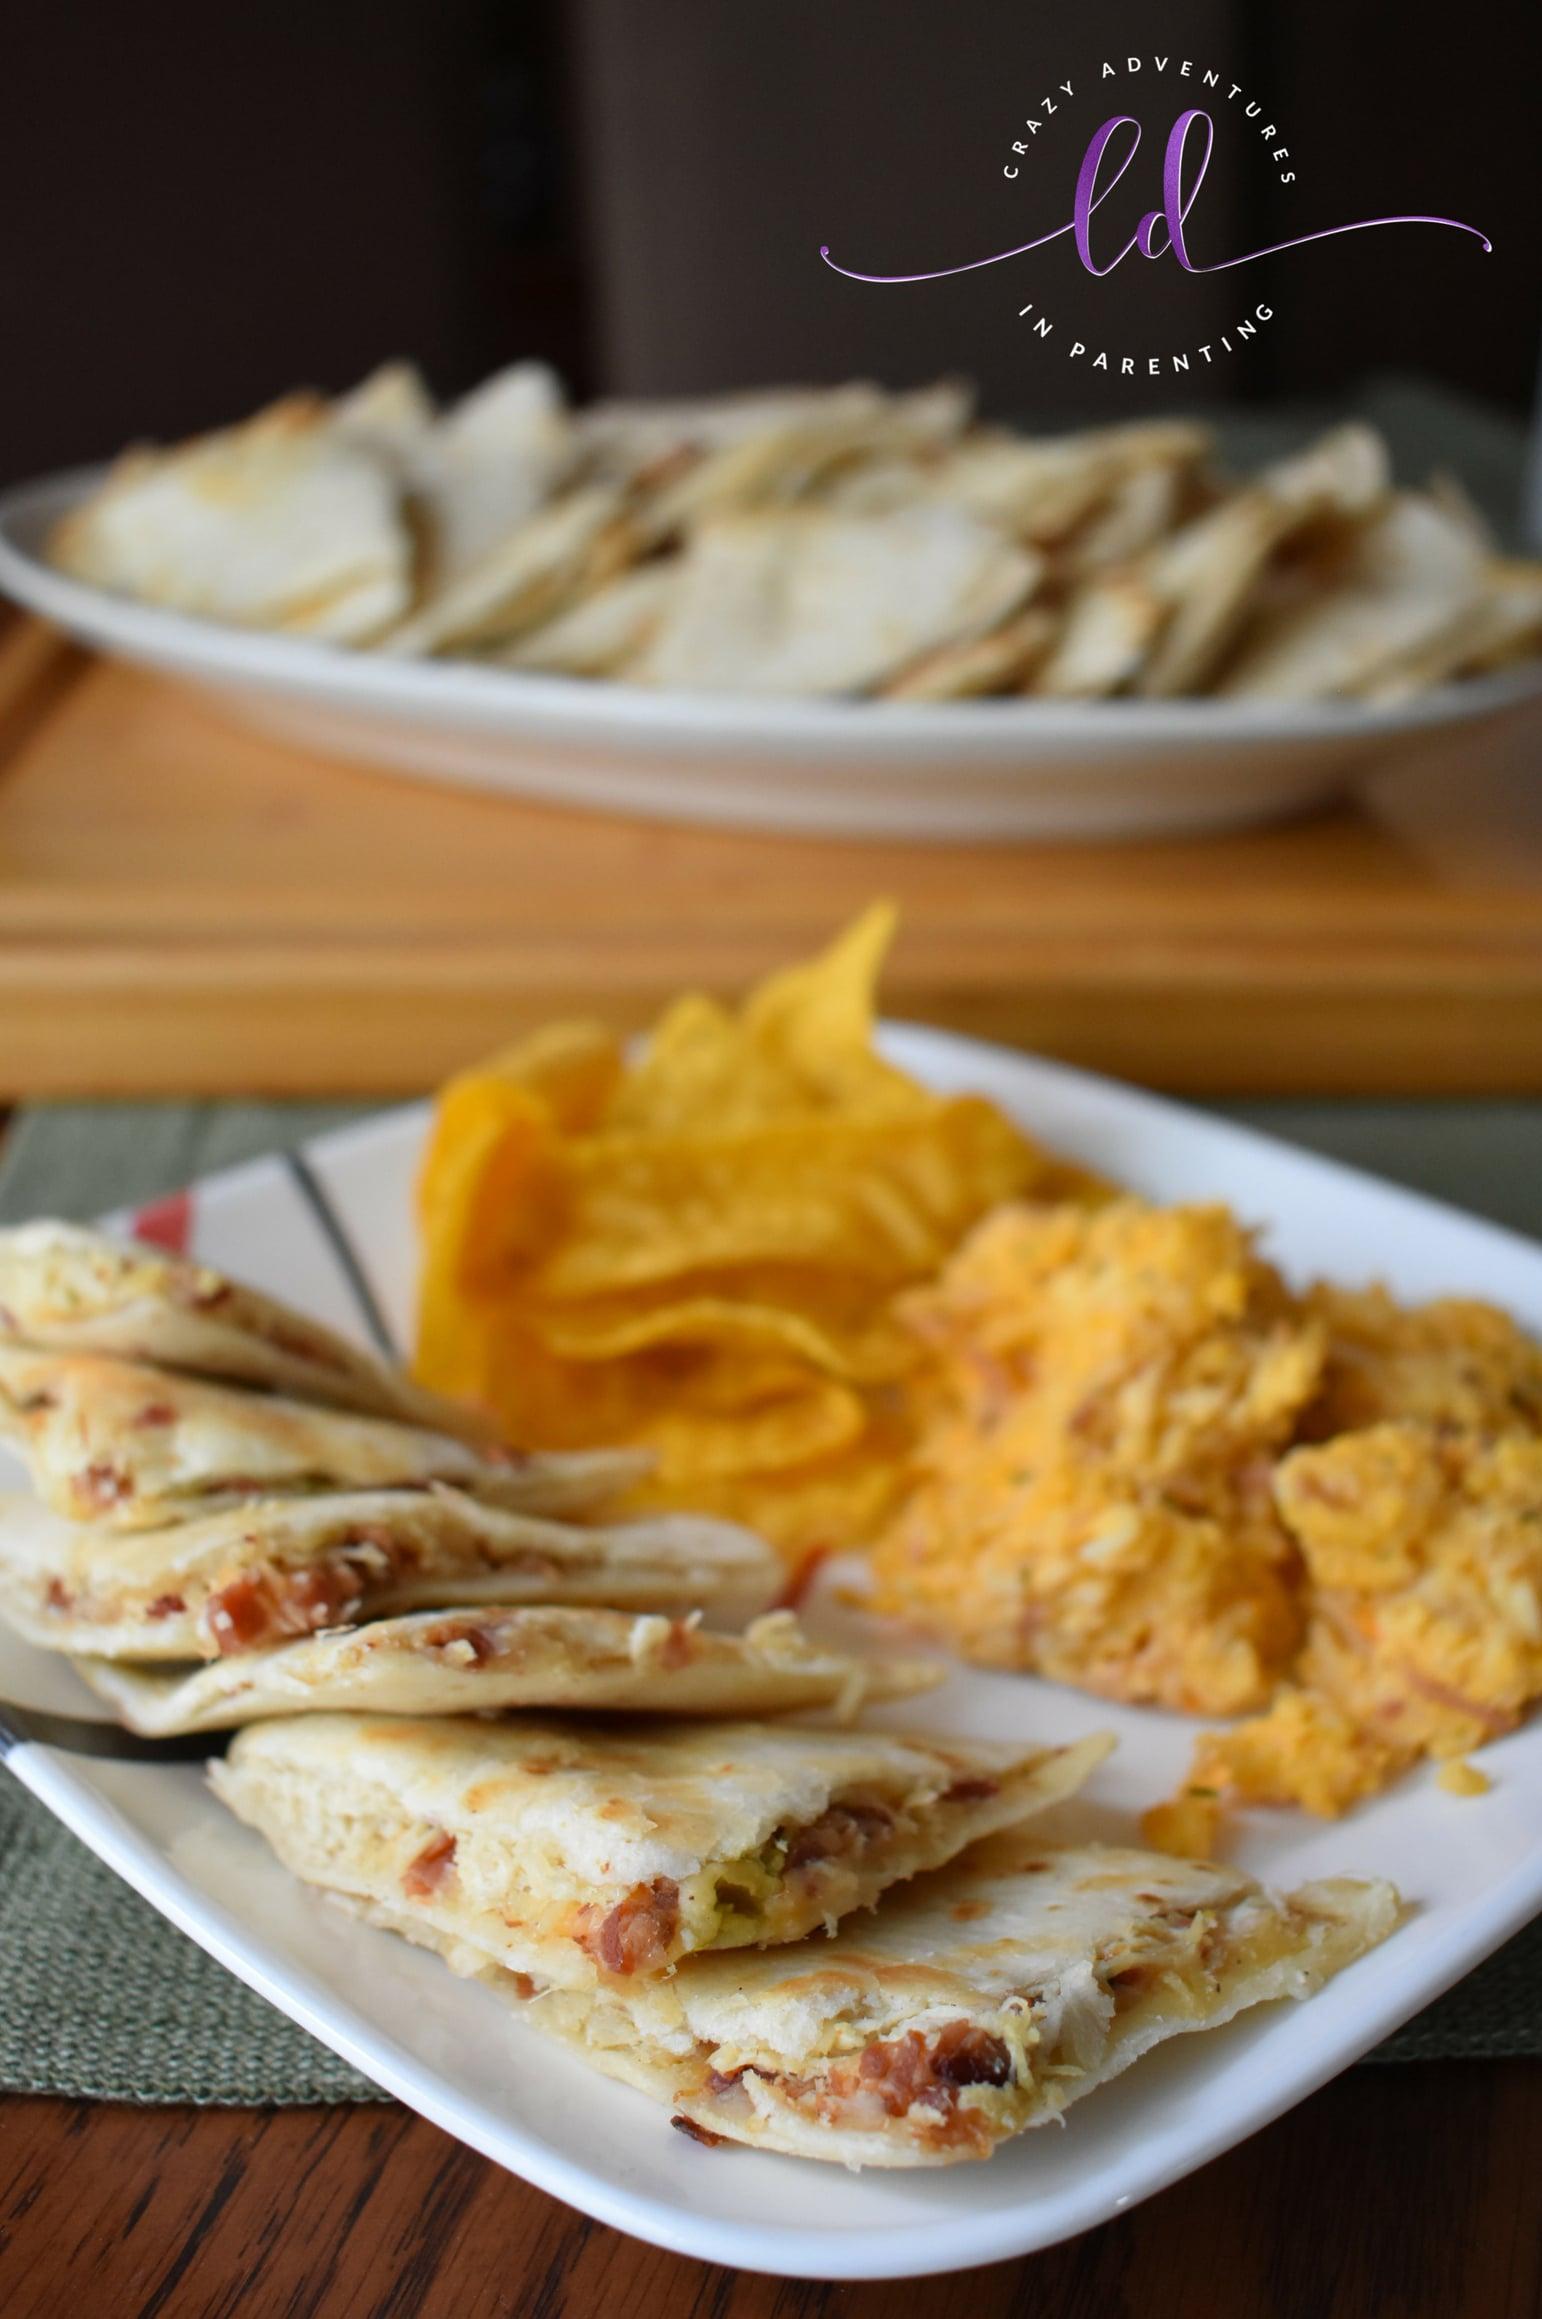 Chili's Copycat Chicken Bacon Ranch Quesadilla Recipe with Jalapeños